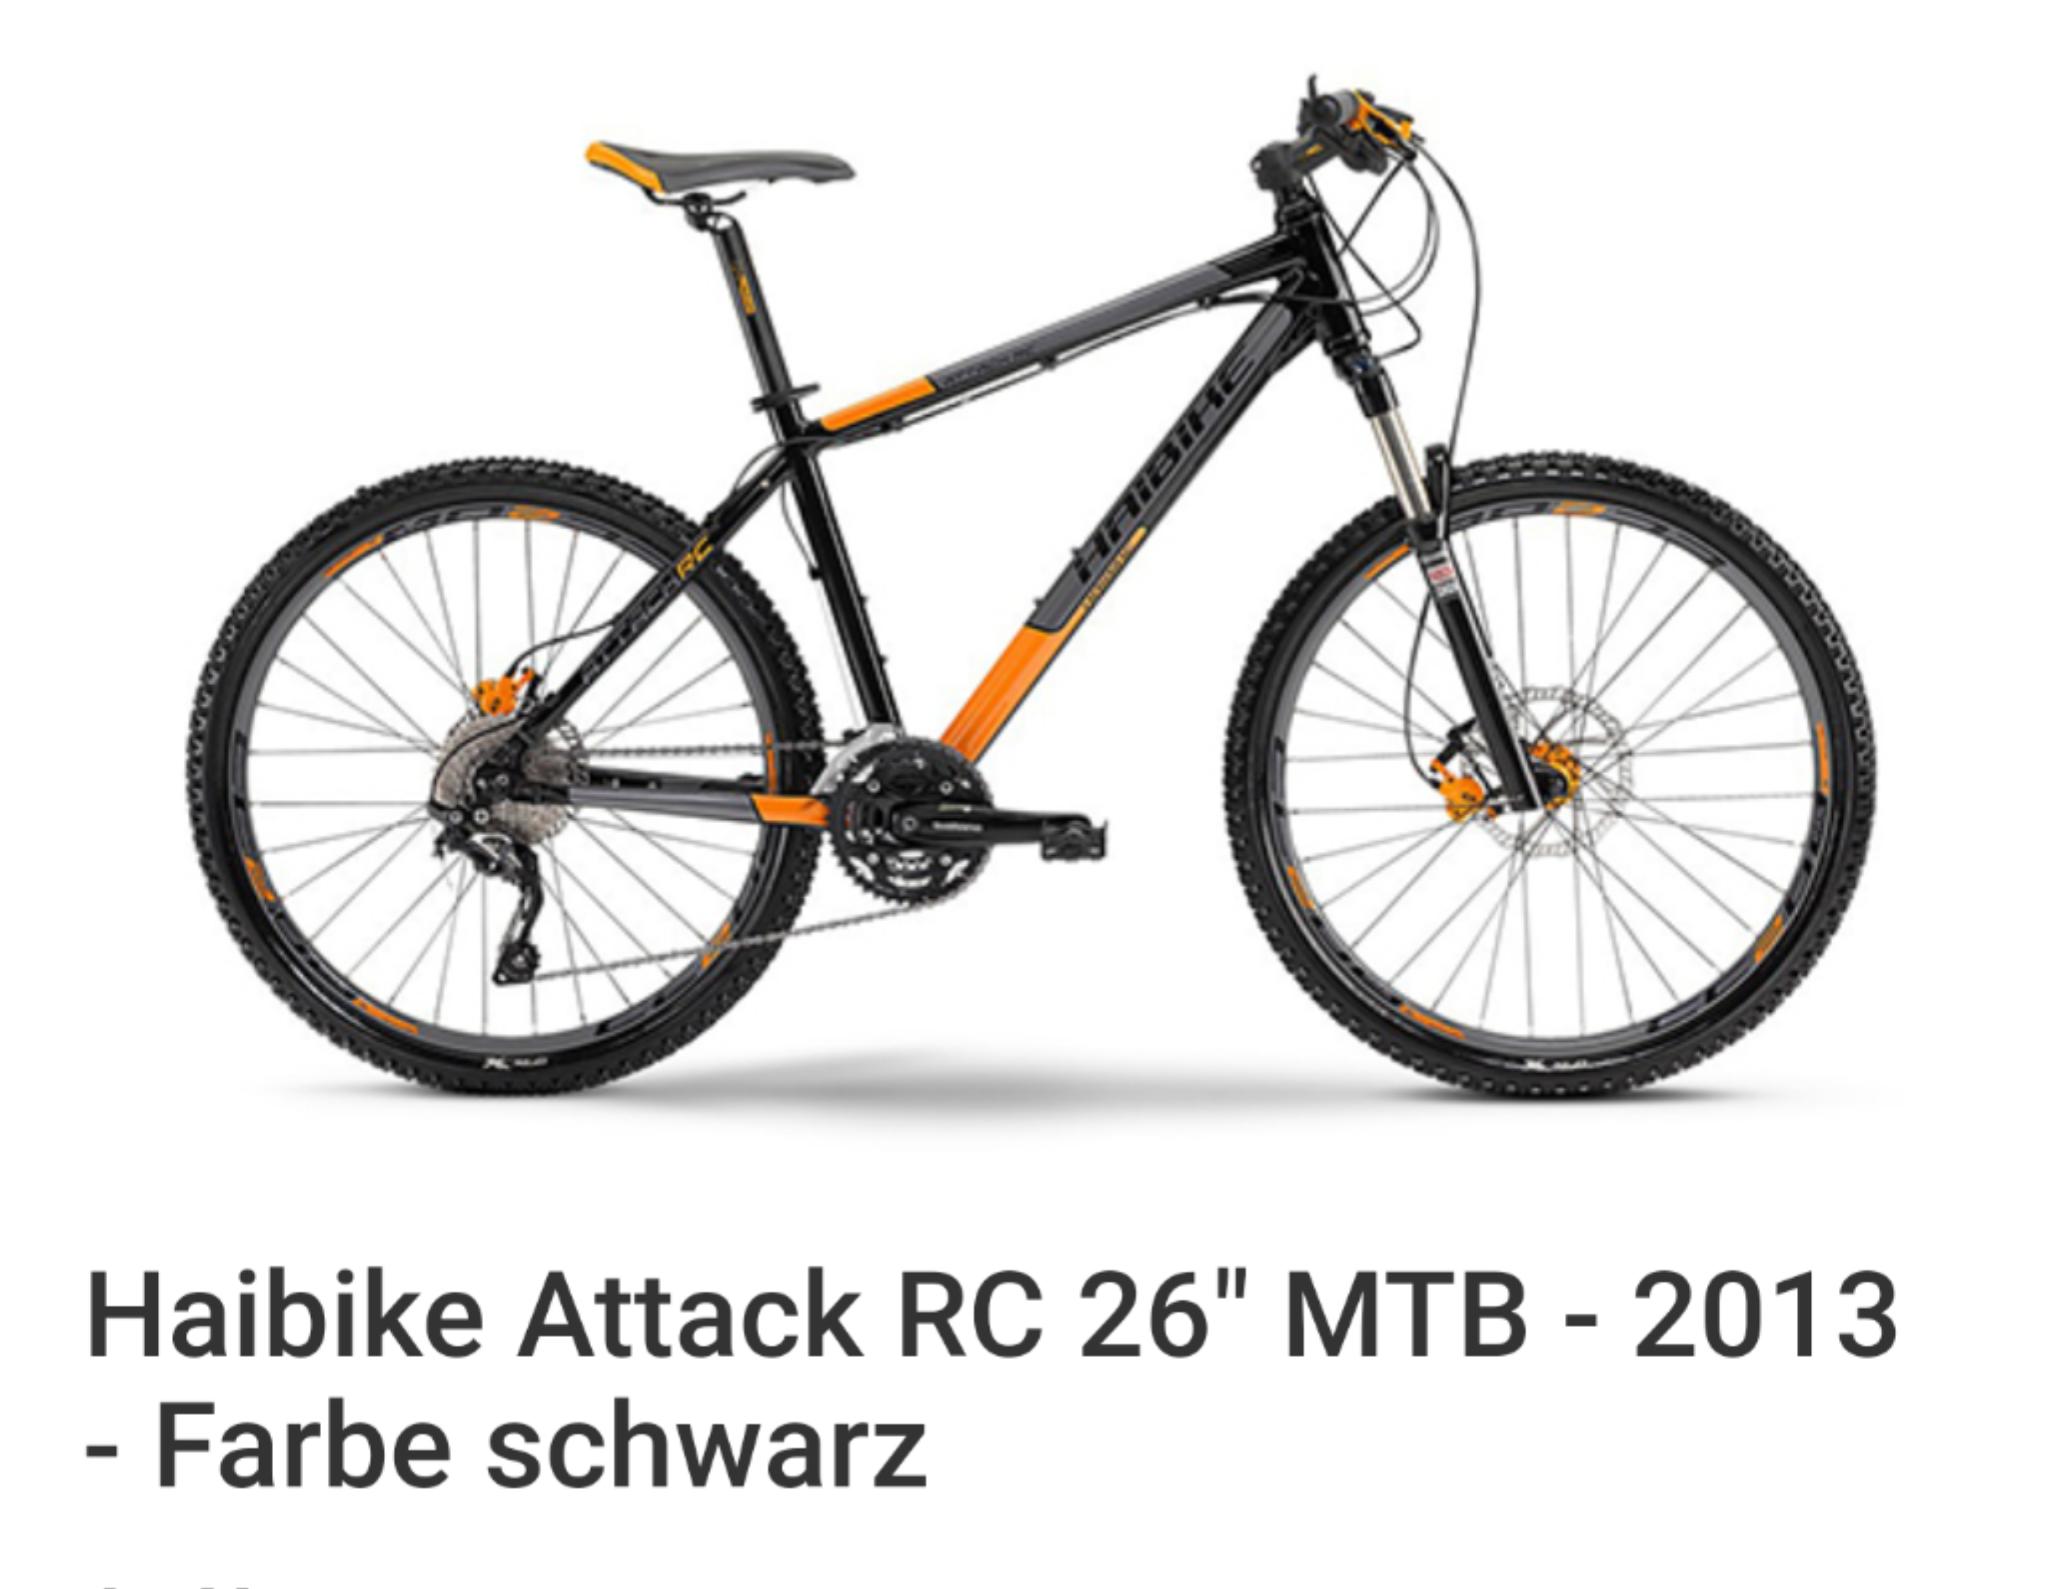 "Haibike Attack RC 26"" MTB - 2013 - Farbe schwarz"